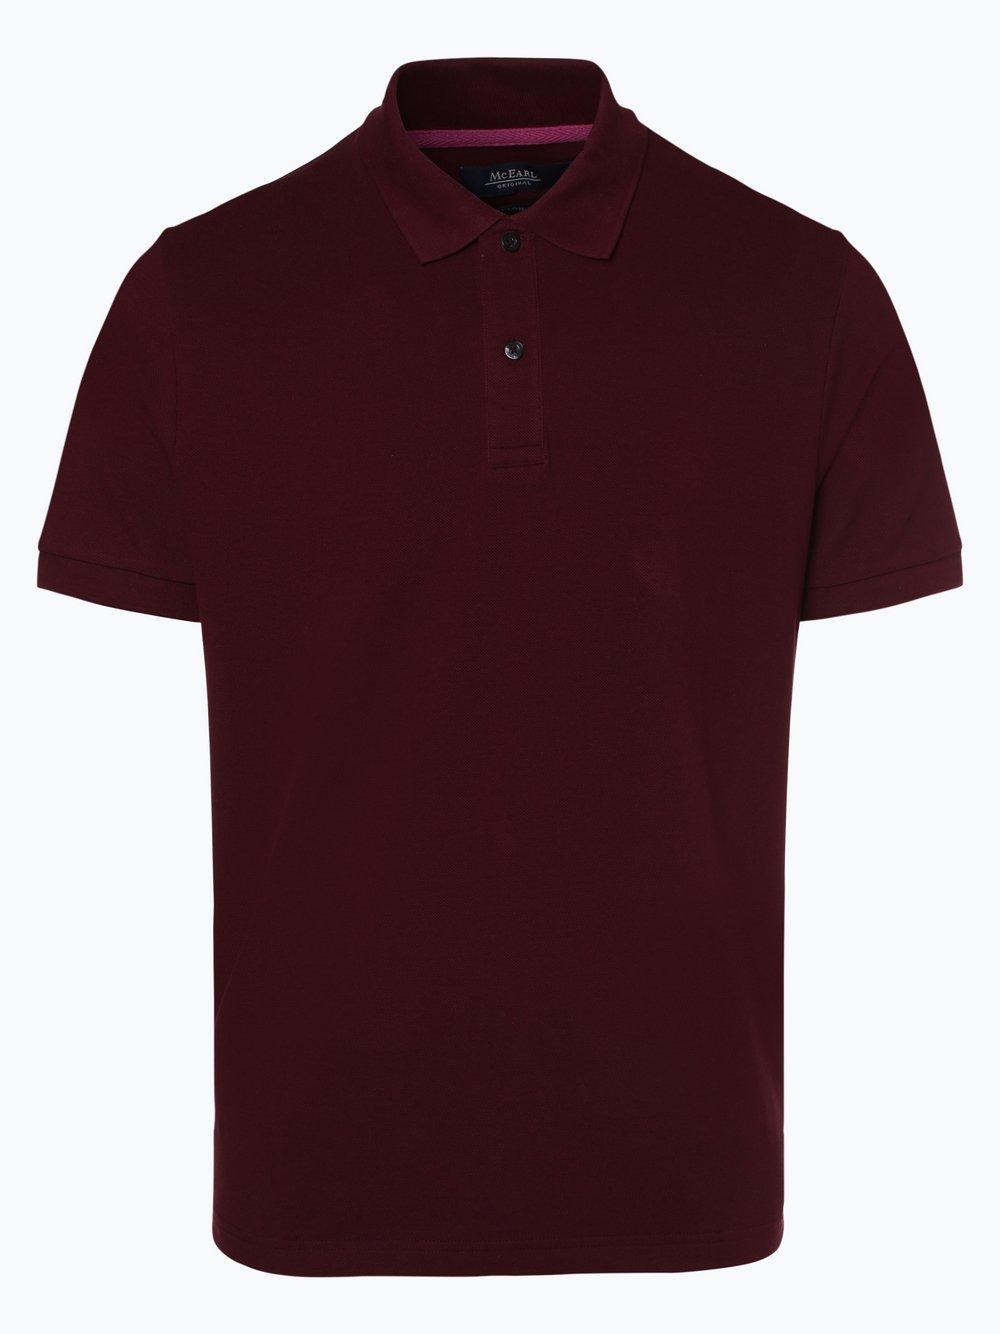 Mc Earl - Męska koszulka polo, czerwony